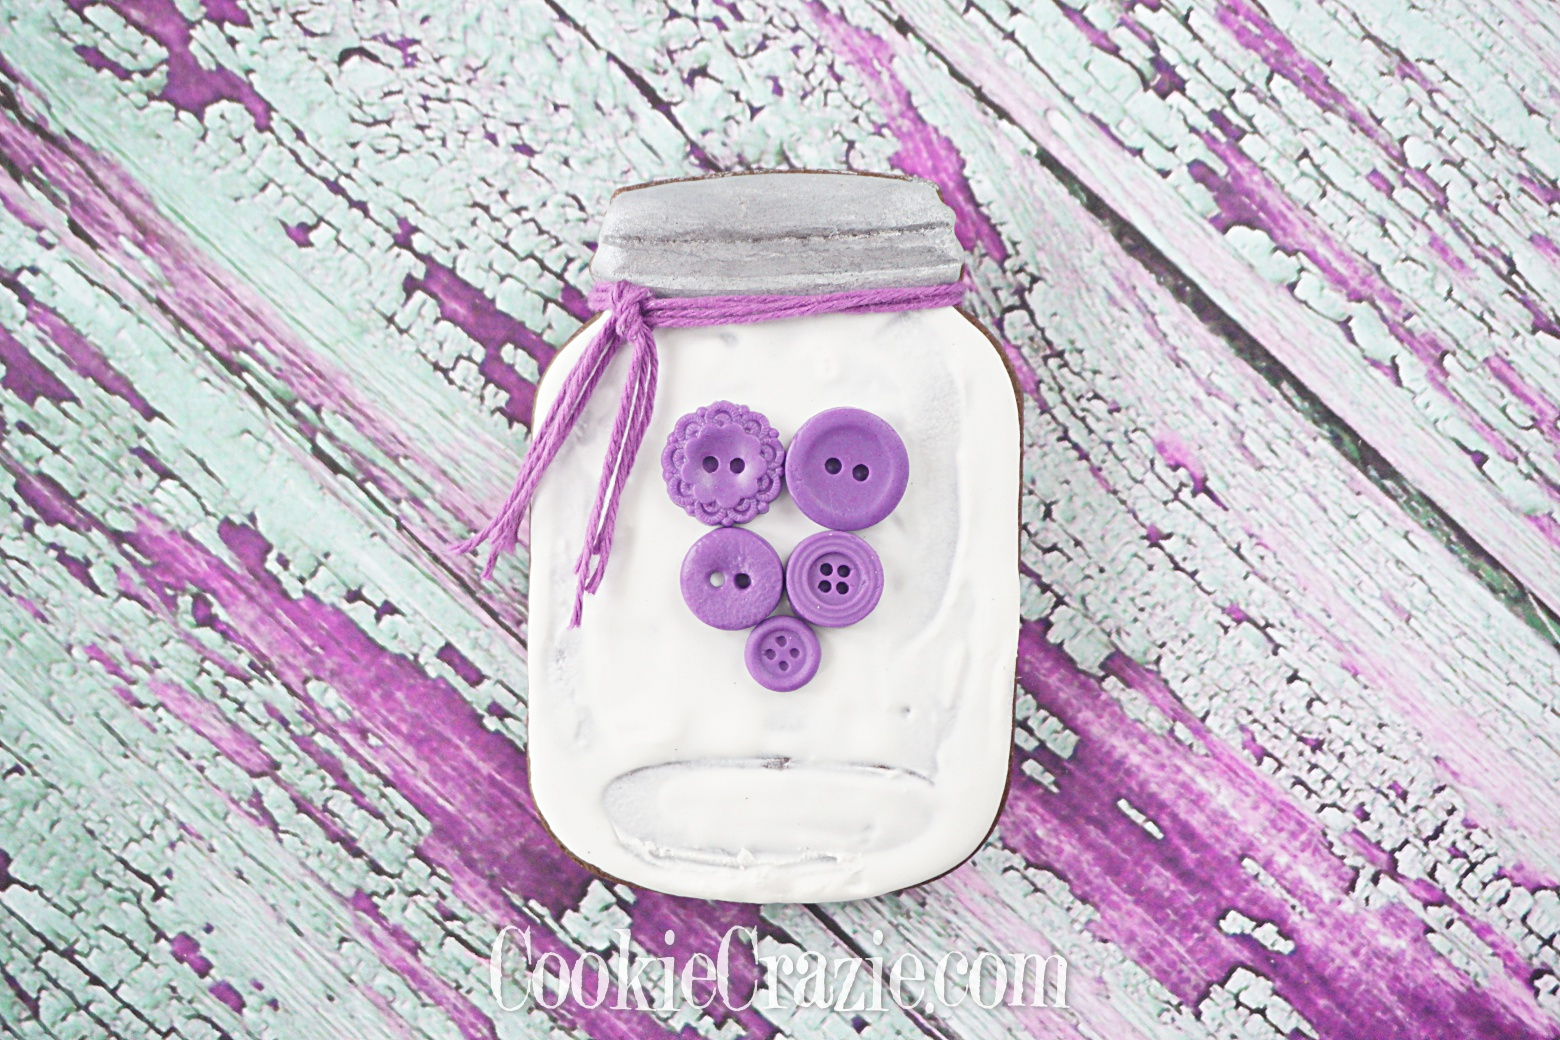 Valentine Mason Jar Decorated Sugar Cookie YouTube video  HERE